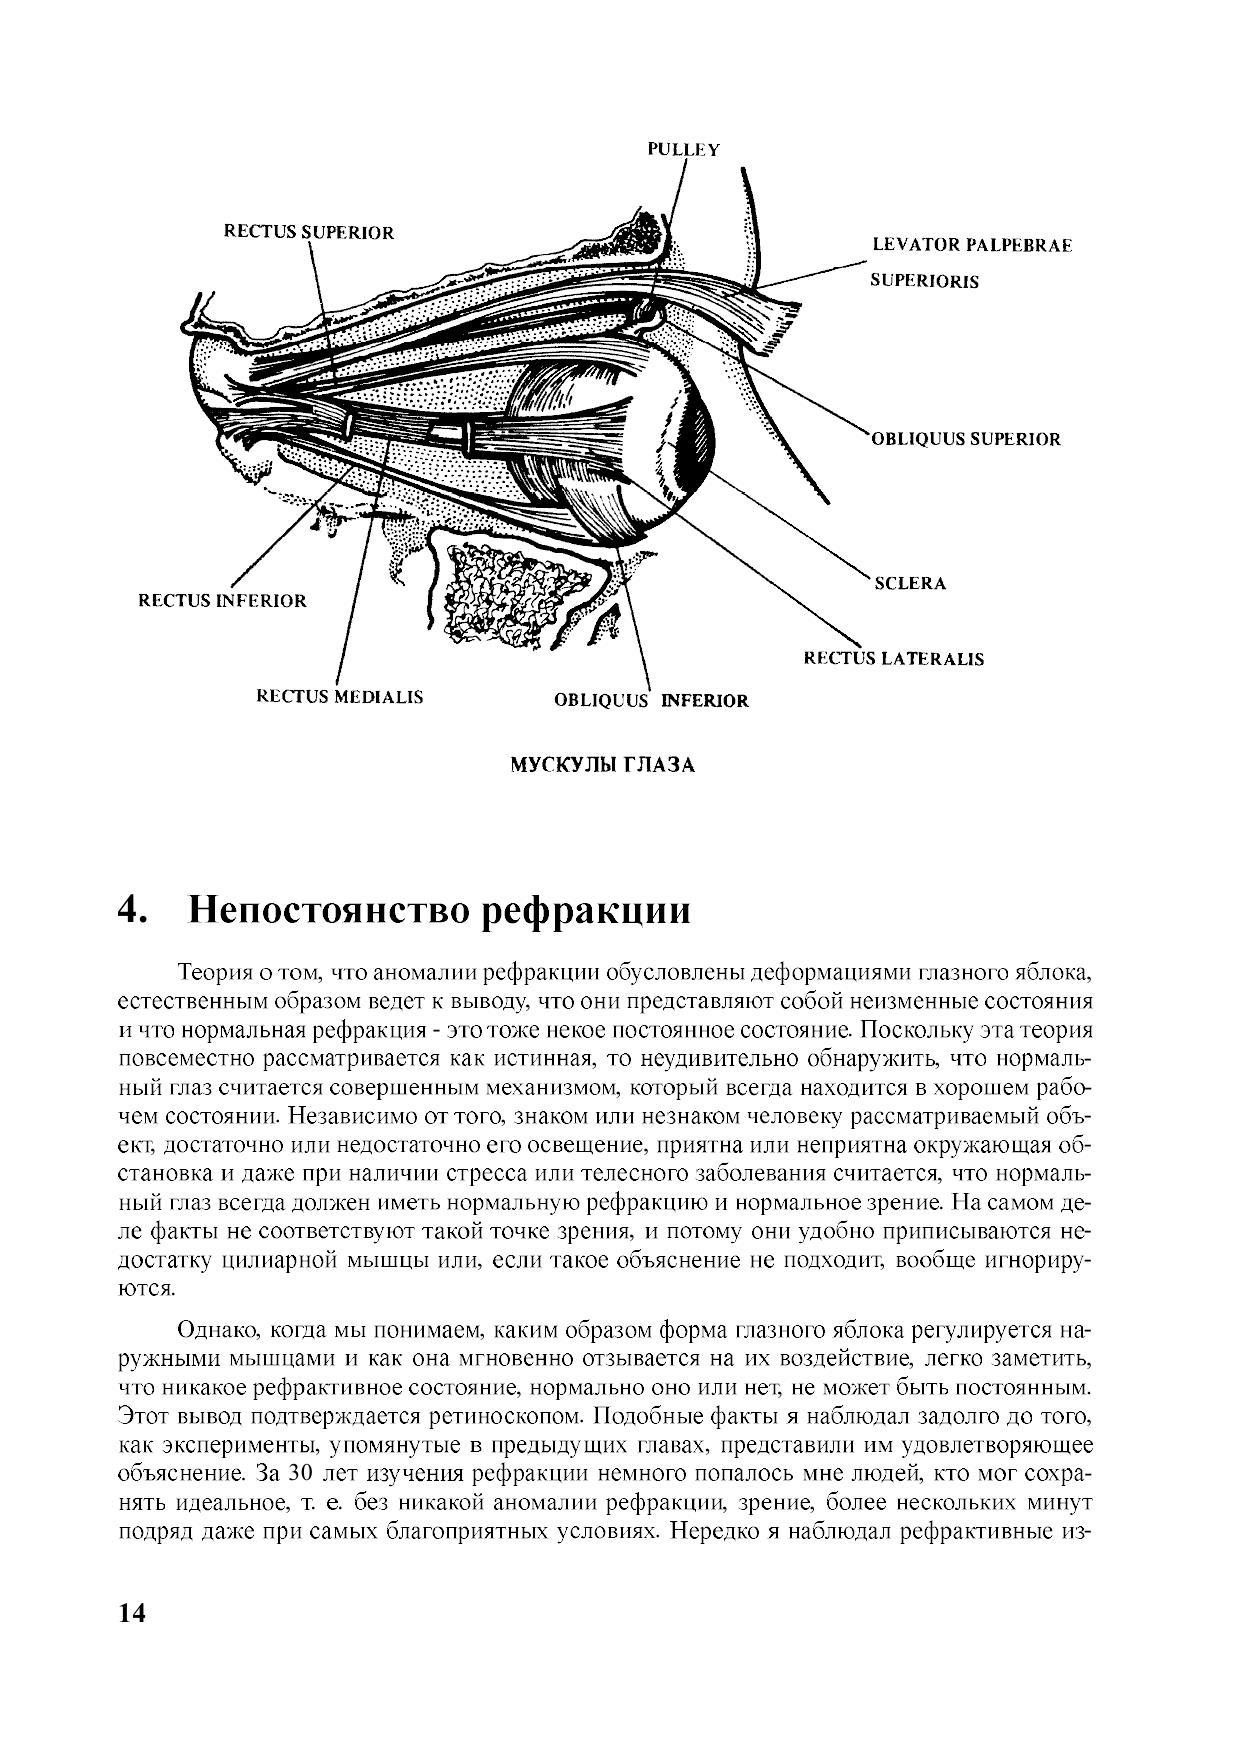 Операция коррекция зрения методом фрк